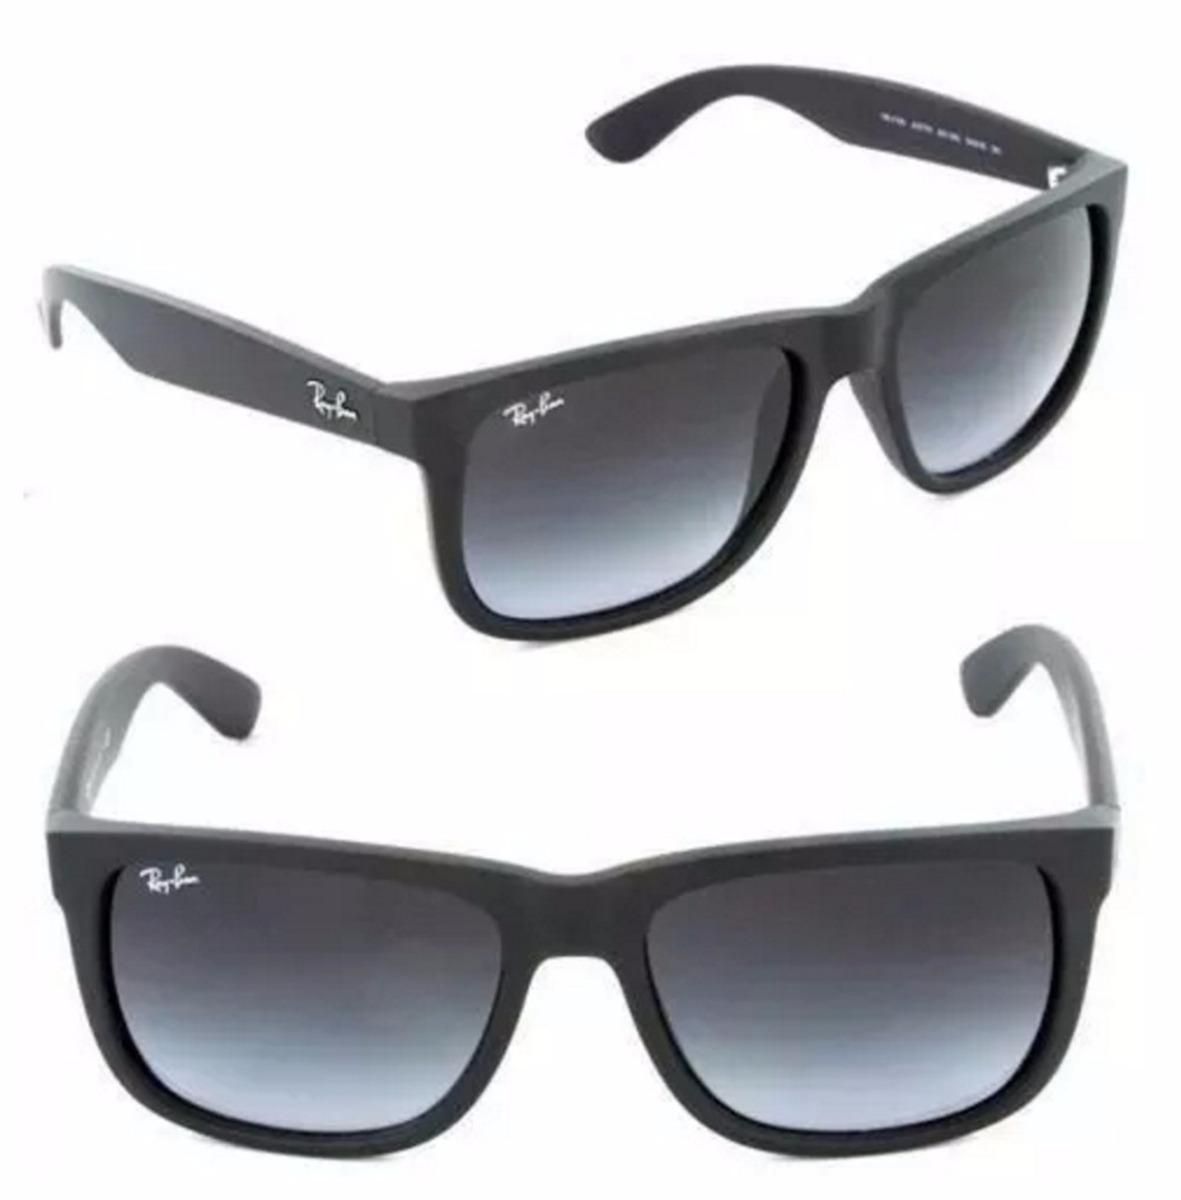 46a17869e6b90 óculos ray ban justin preto degrade orignal rb4165 622 t3 po. Carregando  zoom.